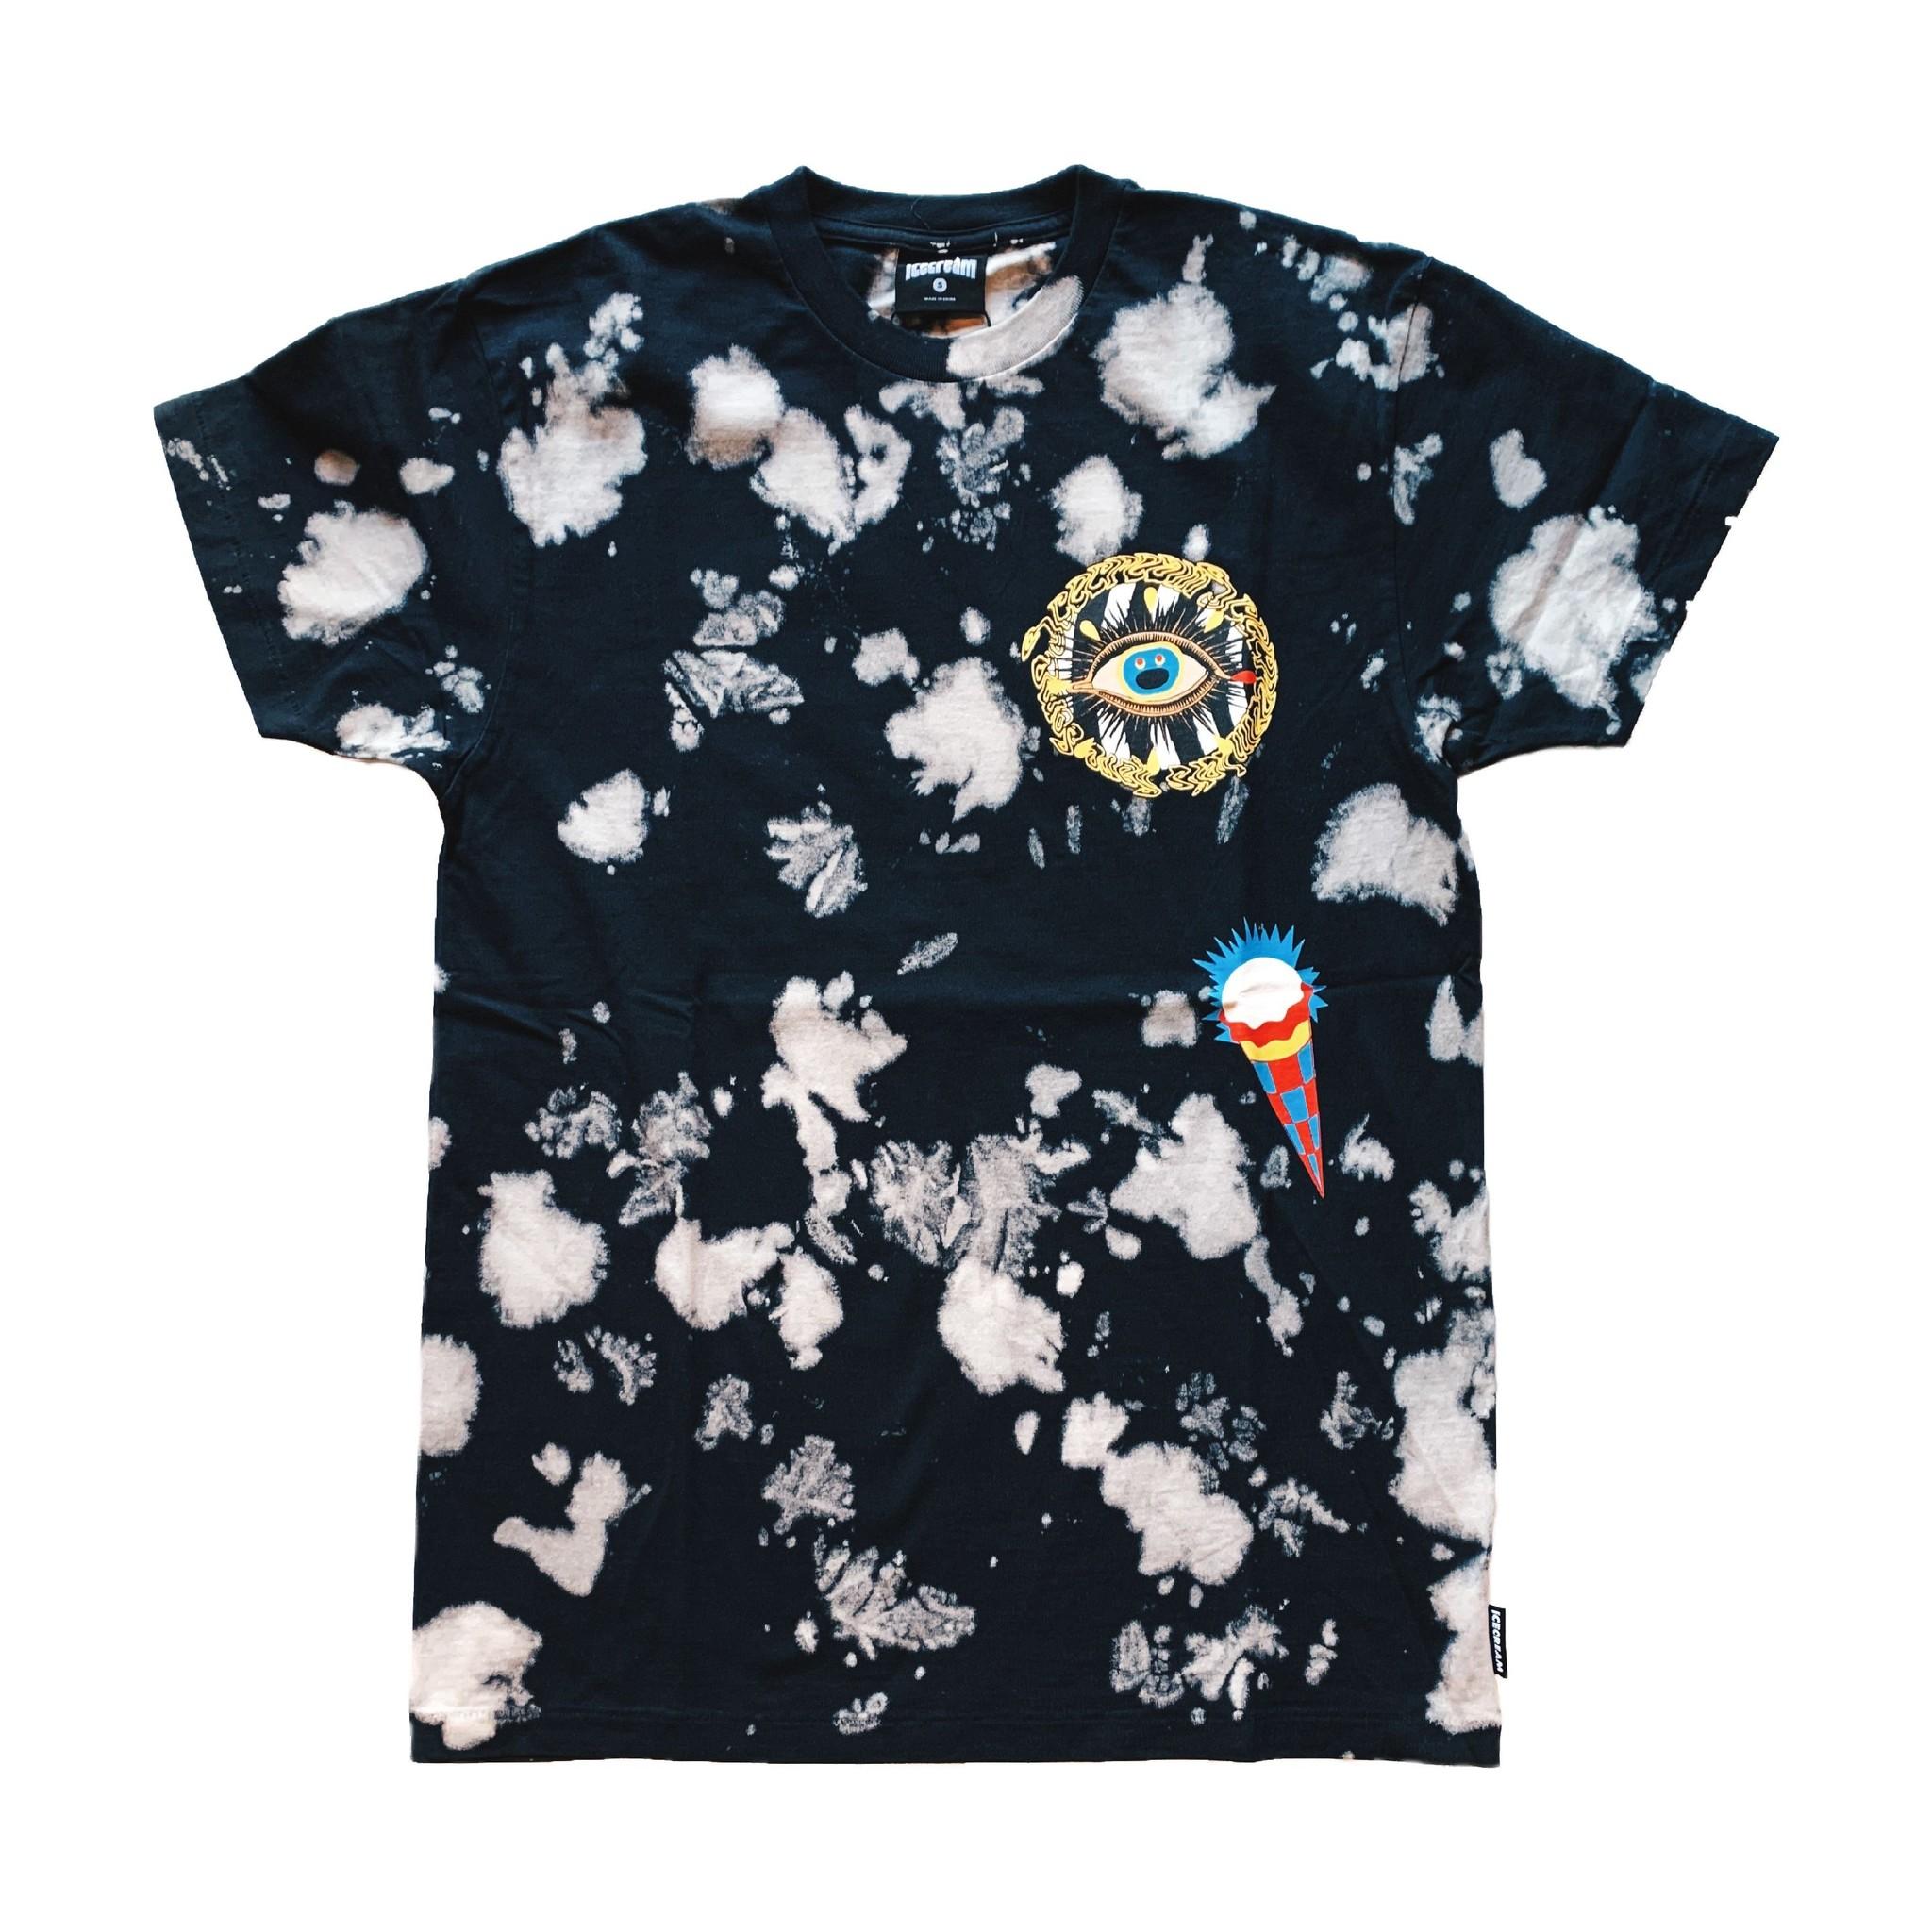 Icecream Icecream Moutain SS Knit Black